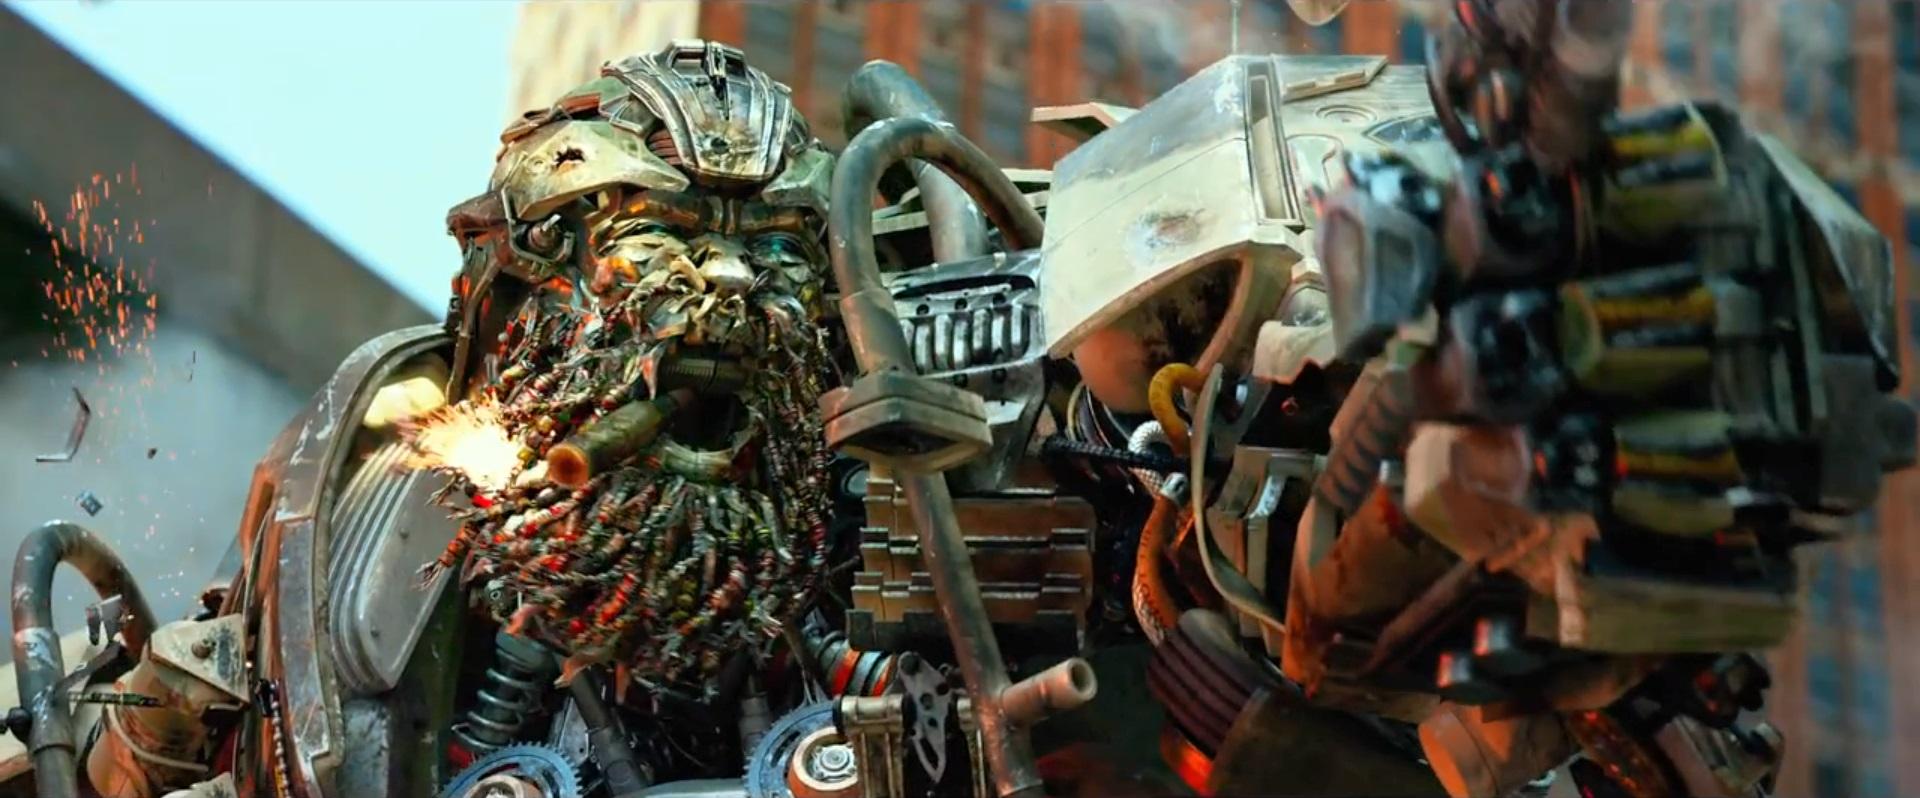 Hound Transformers Film Series Wiki Fandom Powered By